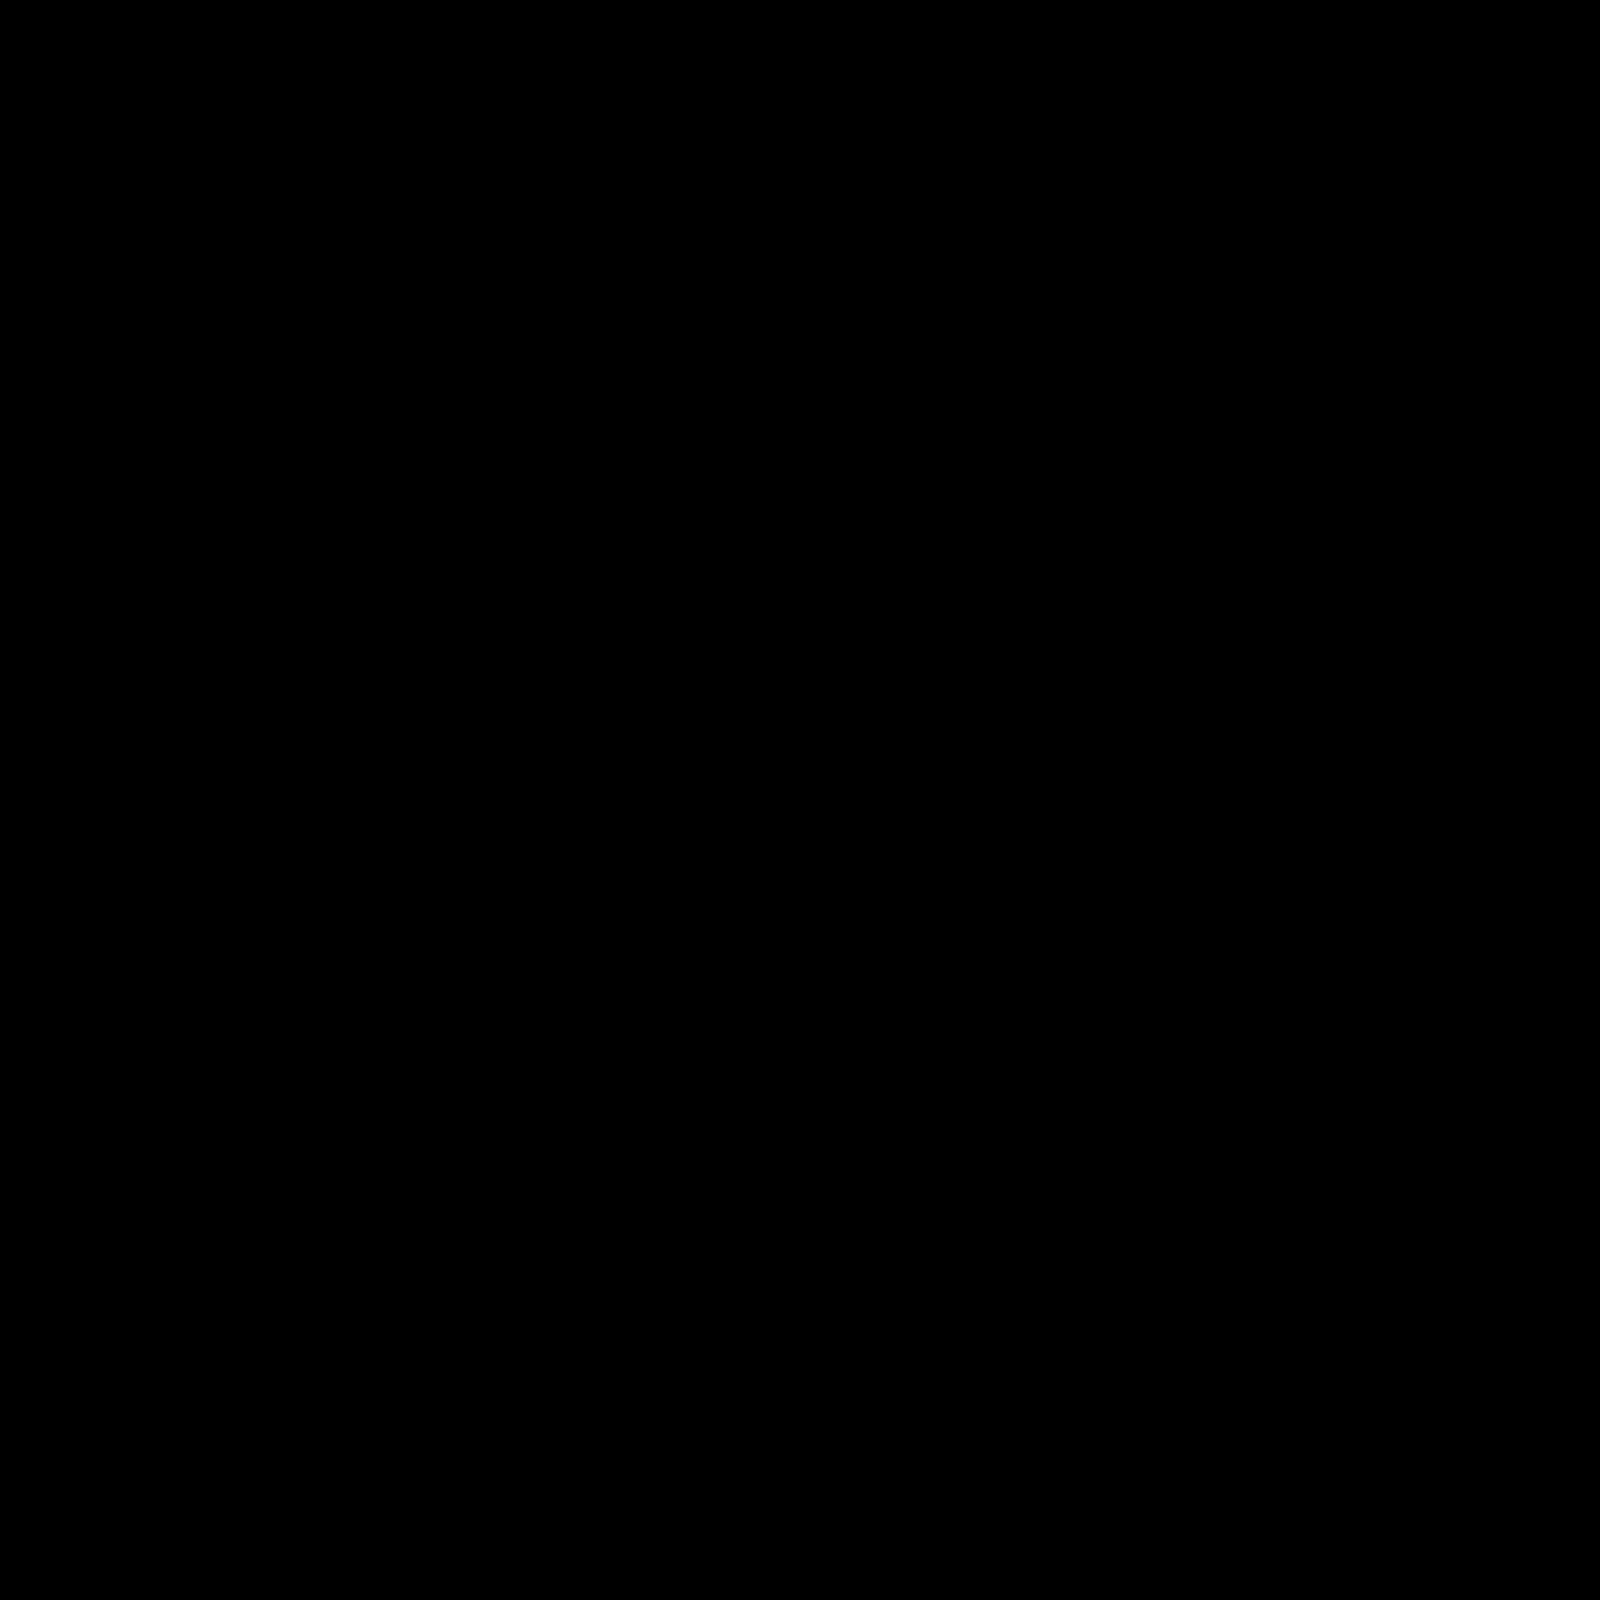 Polishing Cloth Filled icon